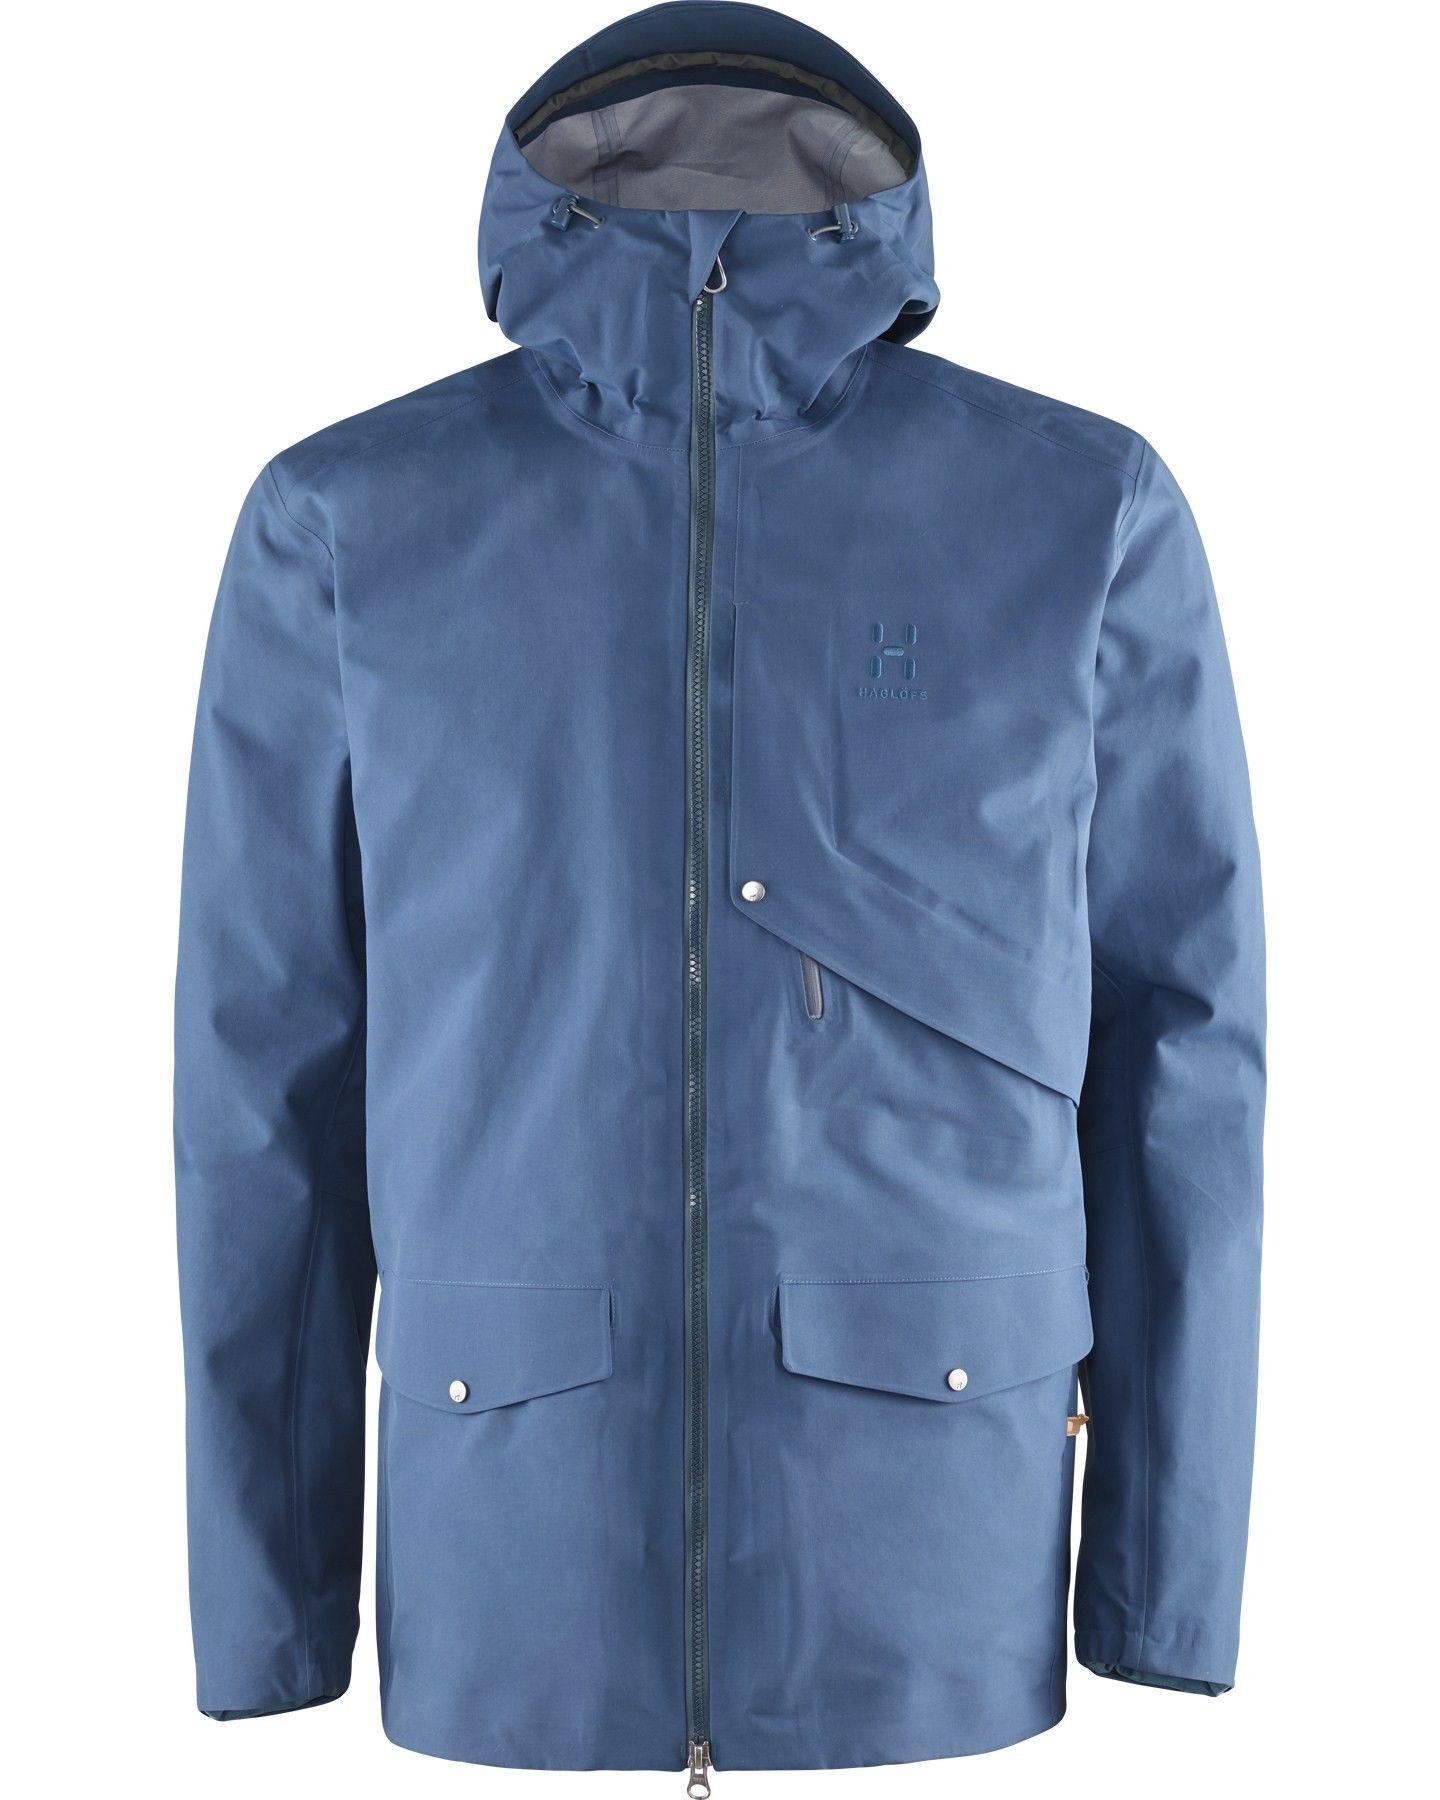 Haglöfs Selja Jacket Blau, Male Gore-Tex® Freizeitjacke, S